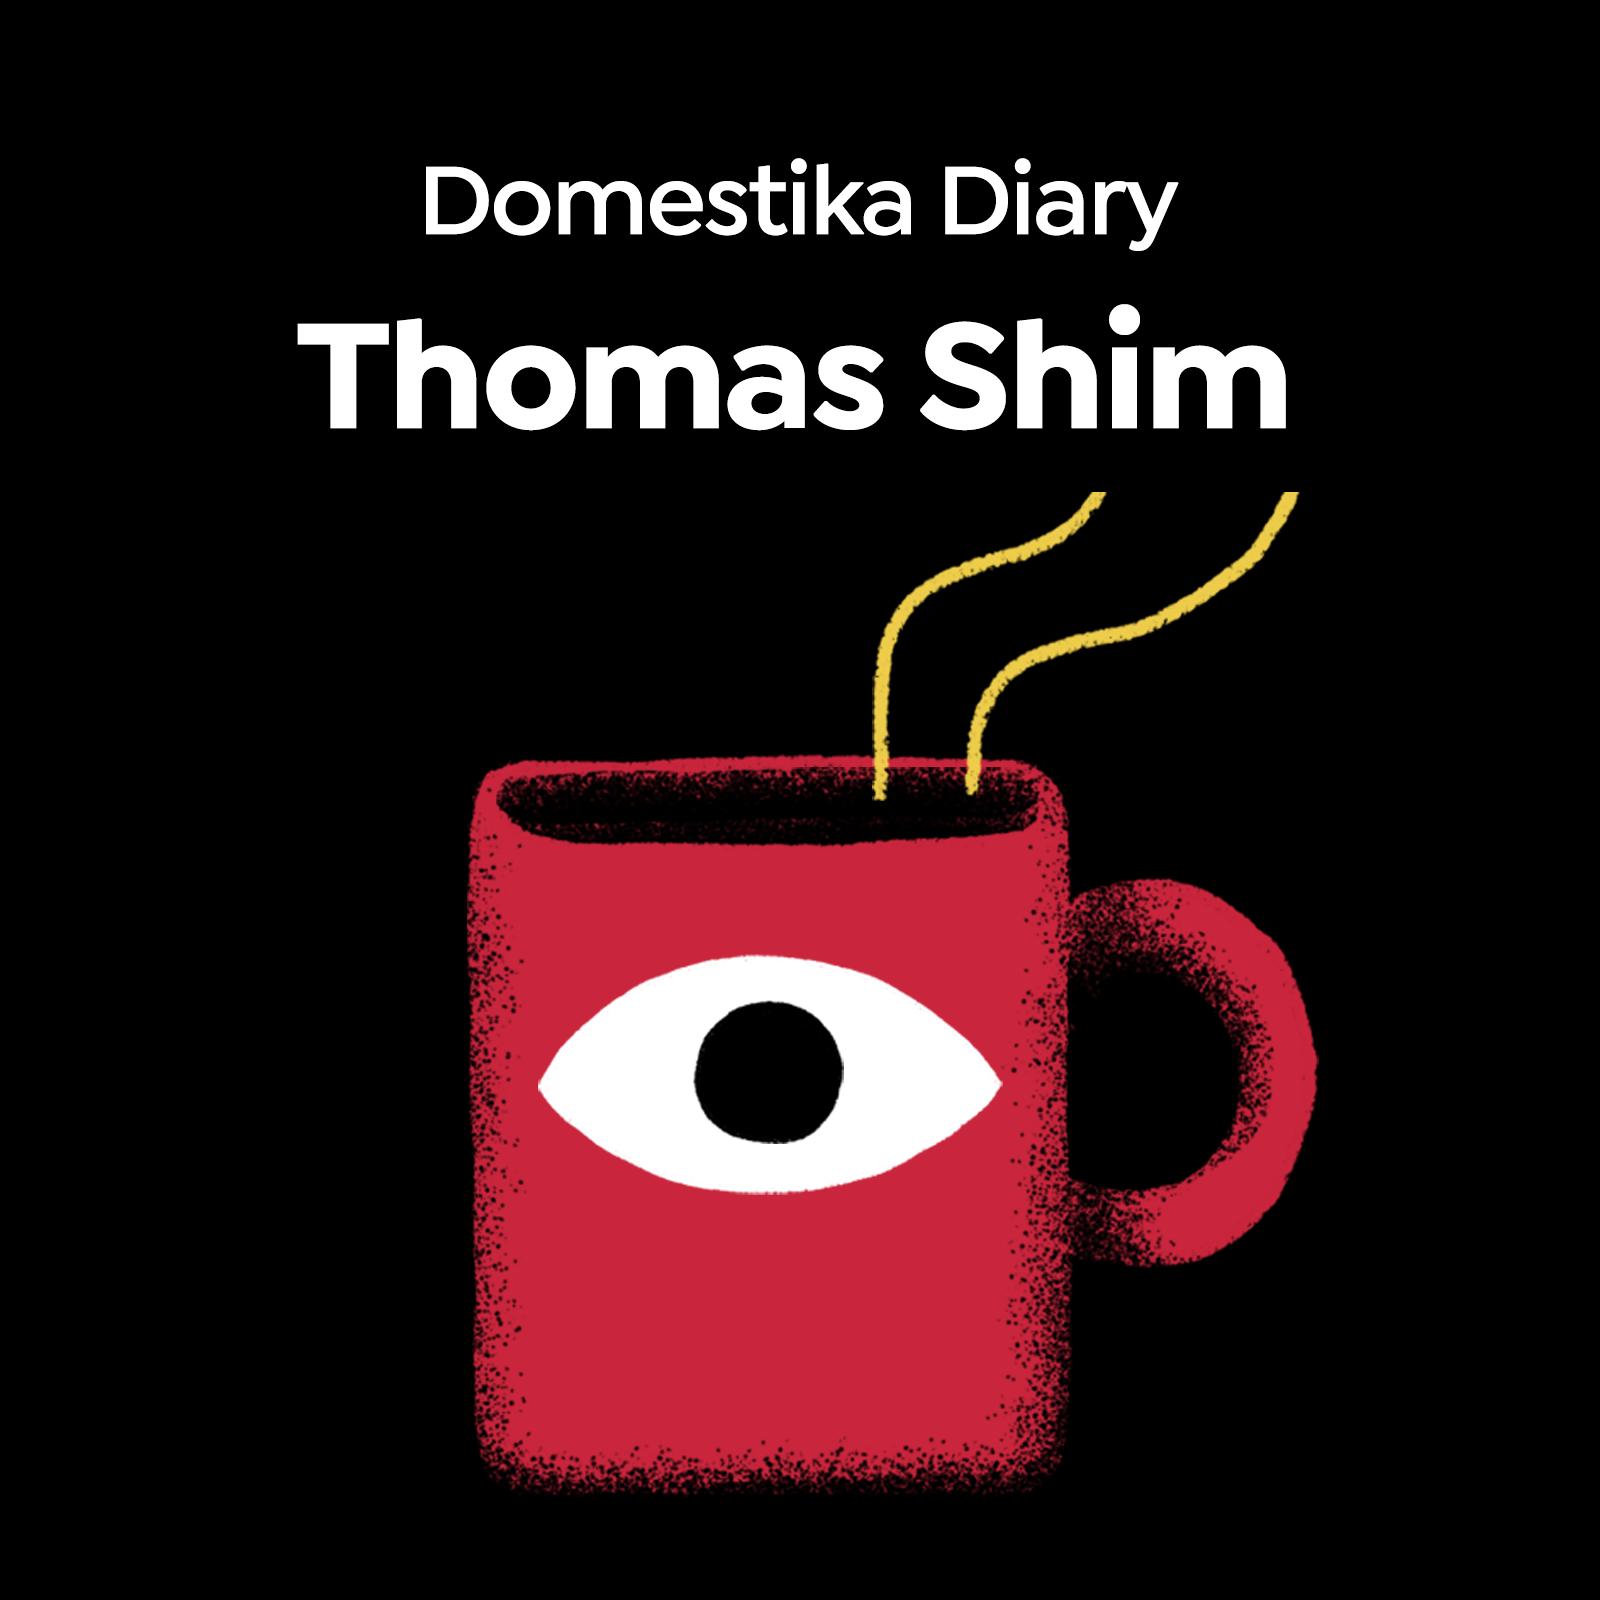 Meet Founder of Pride Train, Thomas Shim, in this Domestika Diary